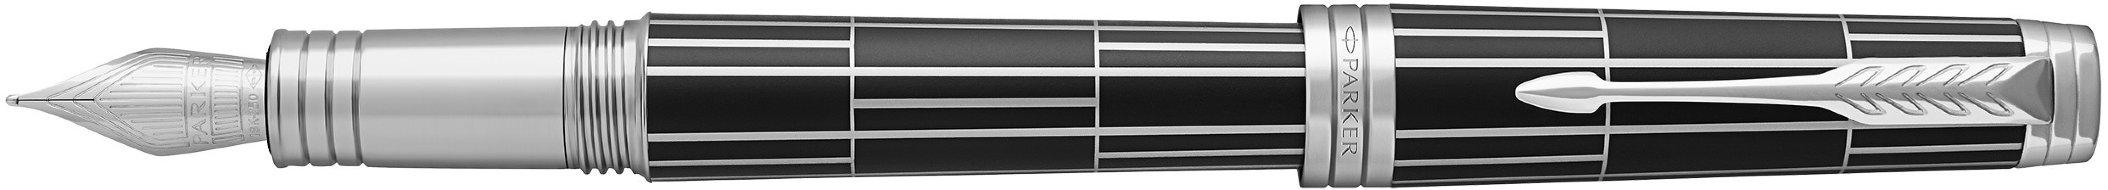 Перьевая ручка Parker Premier F565 Luxury Black CT, перо F, подарочная коробка в Воронеже